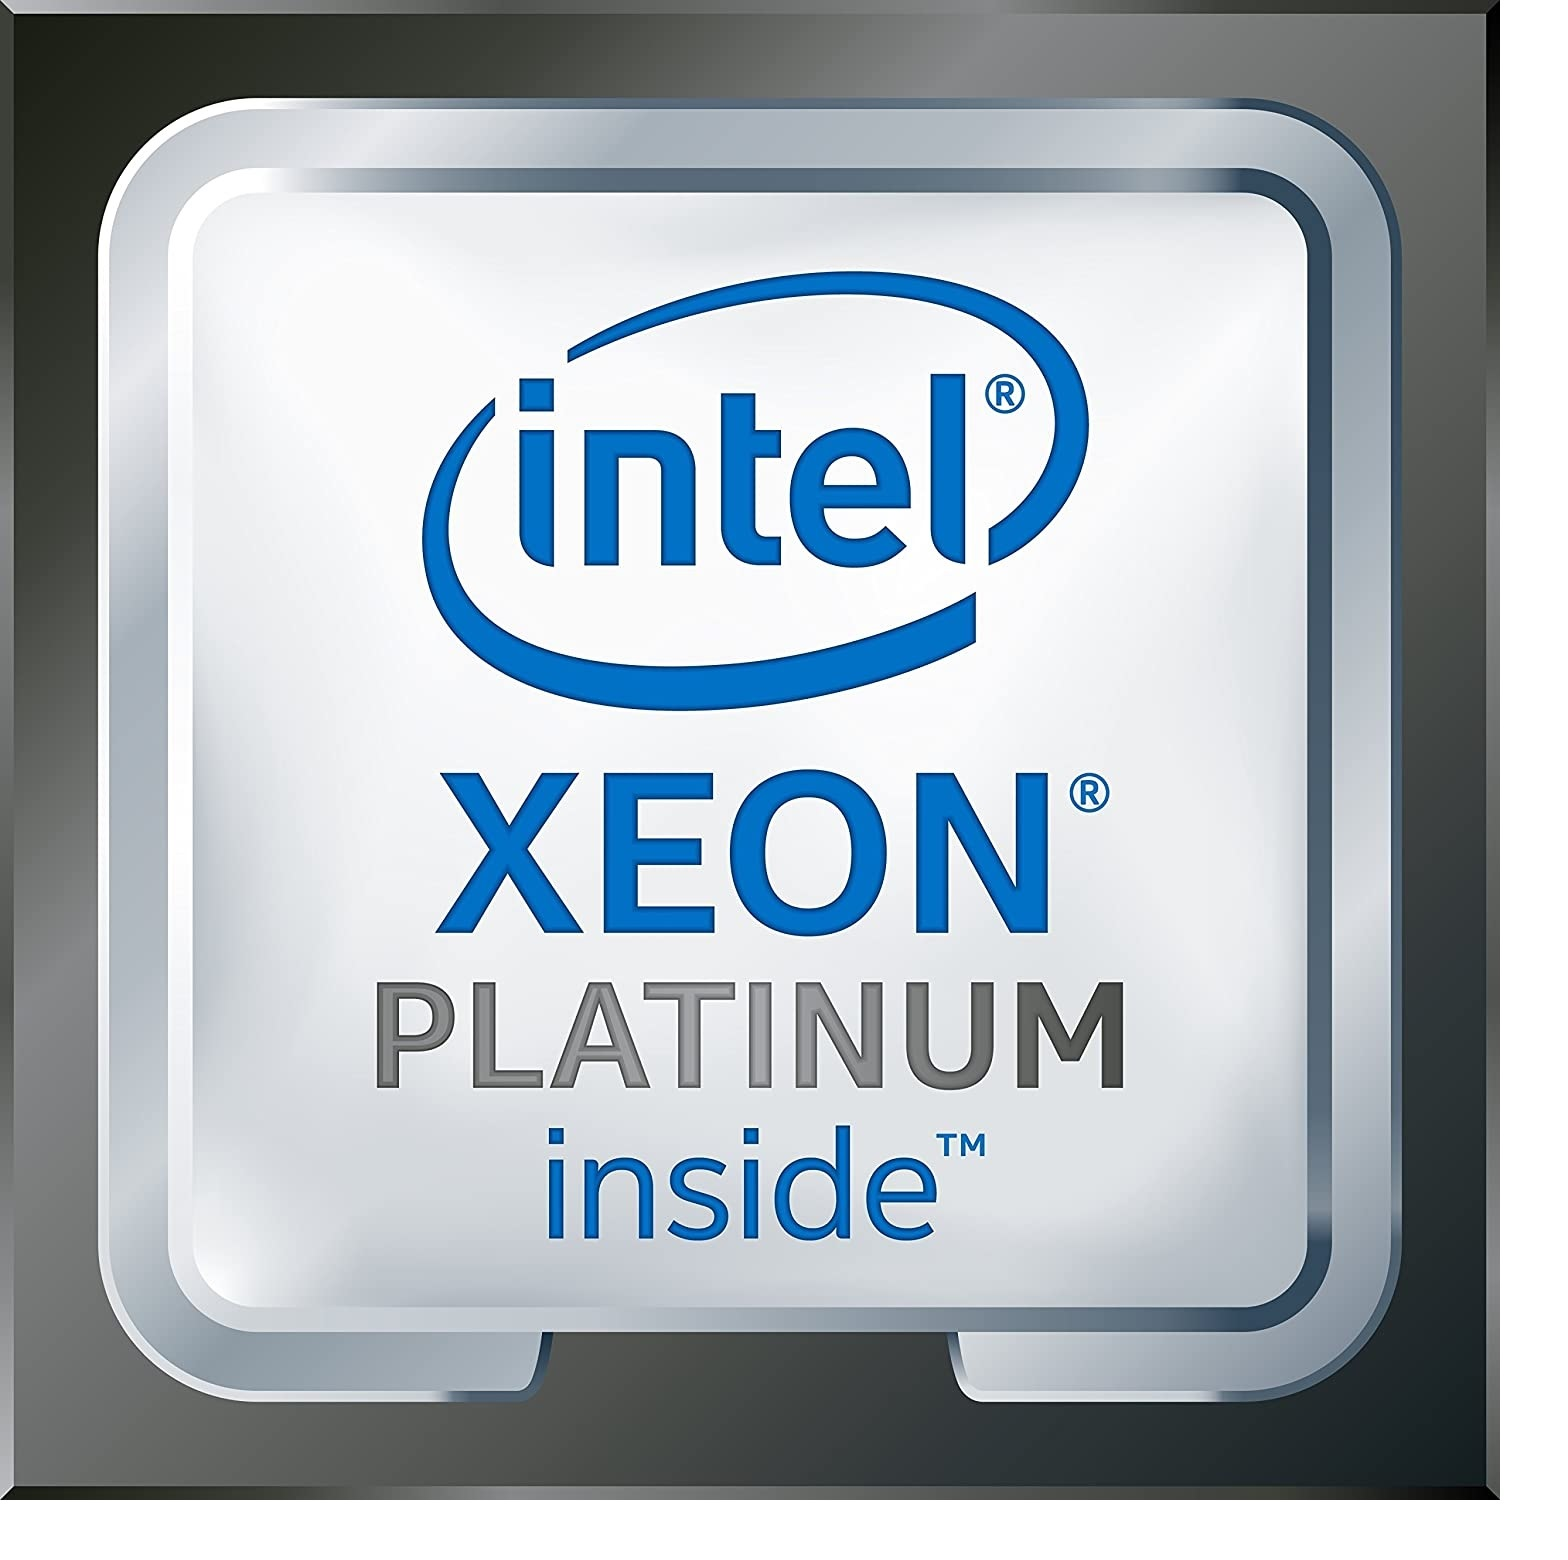 Intel Xeon Platinum 8368Q 2.60GHz Processor